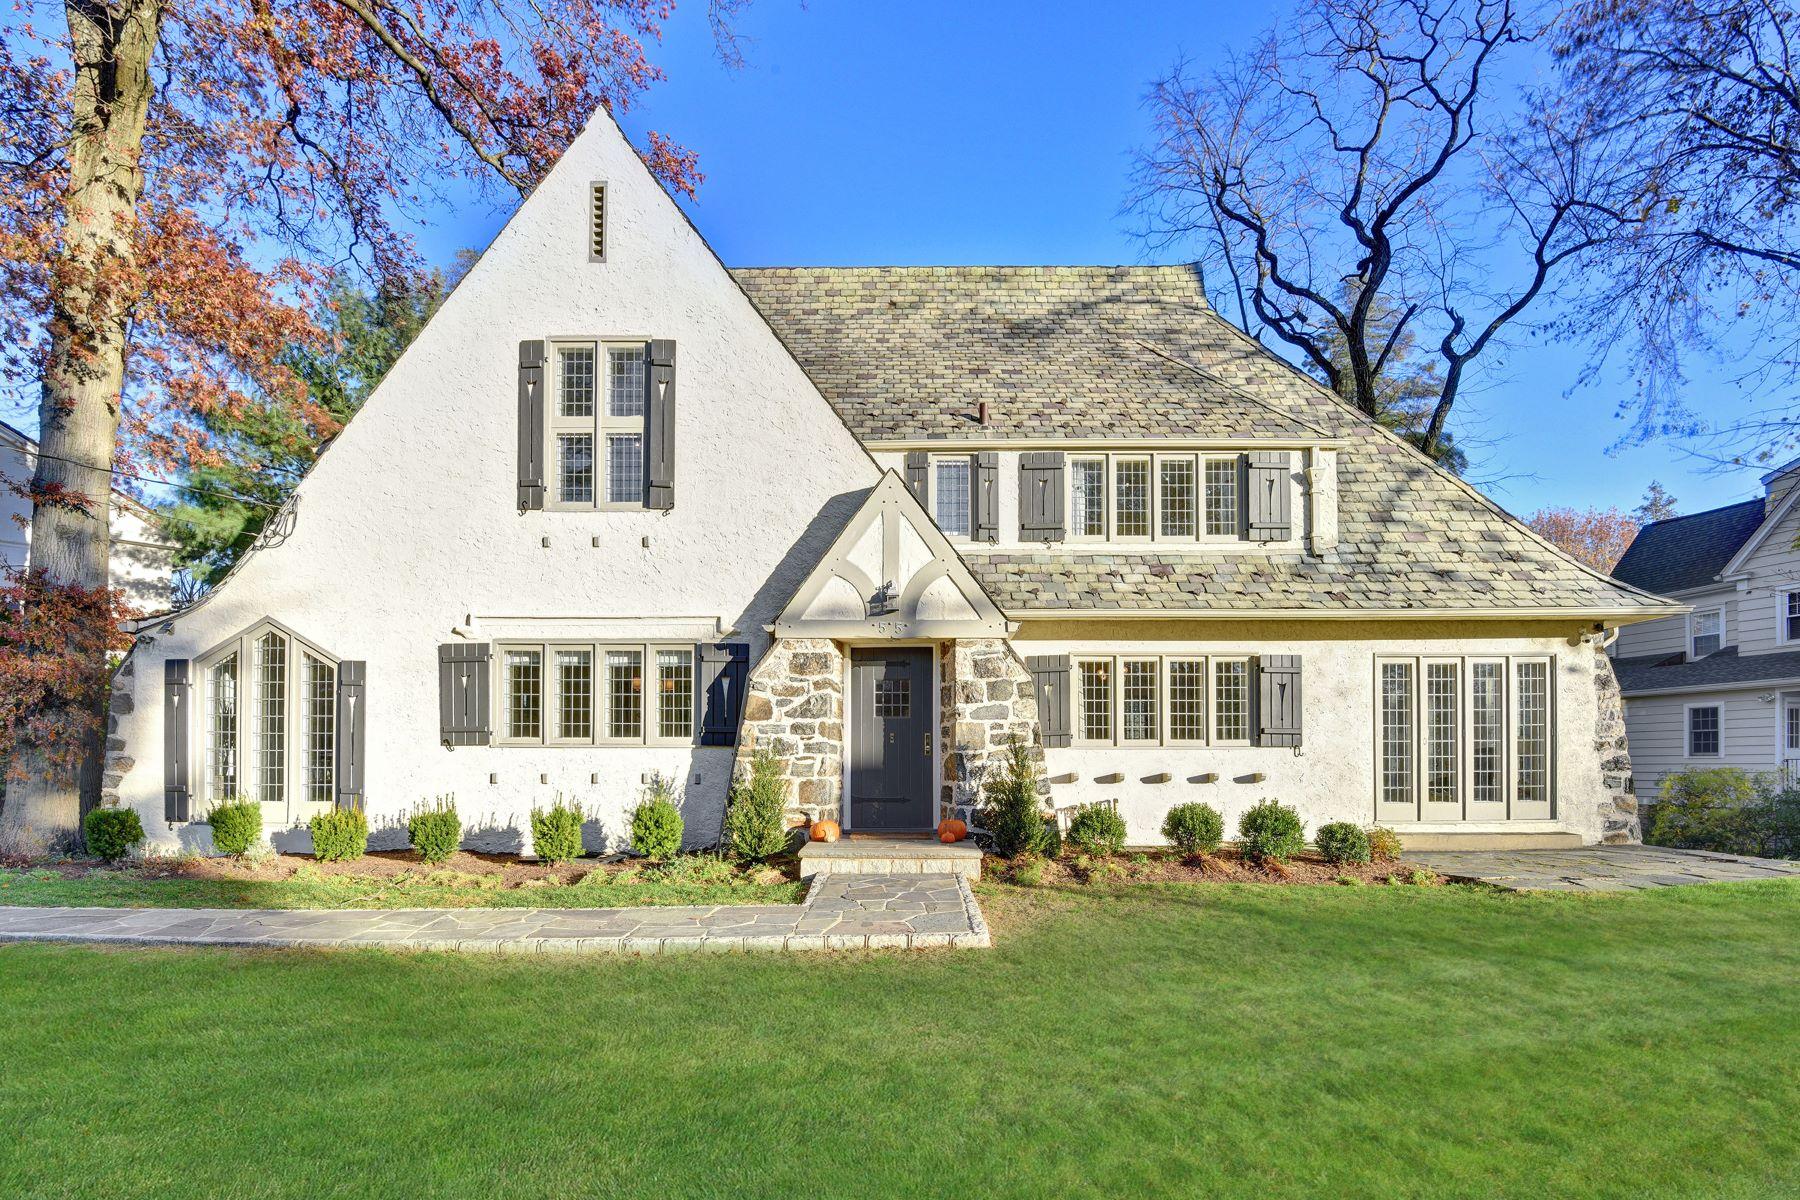 独户住宅 为 销售 在 Modern Sundrenched Tudor 55 Lyncroft Road 新罗谢尔, 纽约州 10804 美国